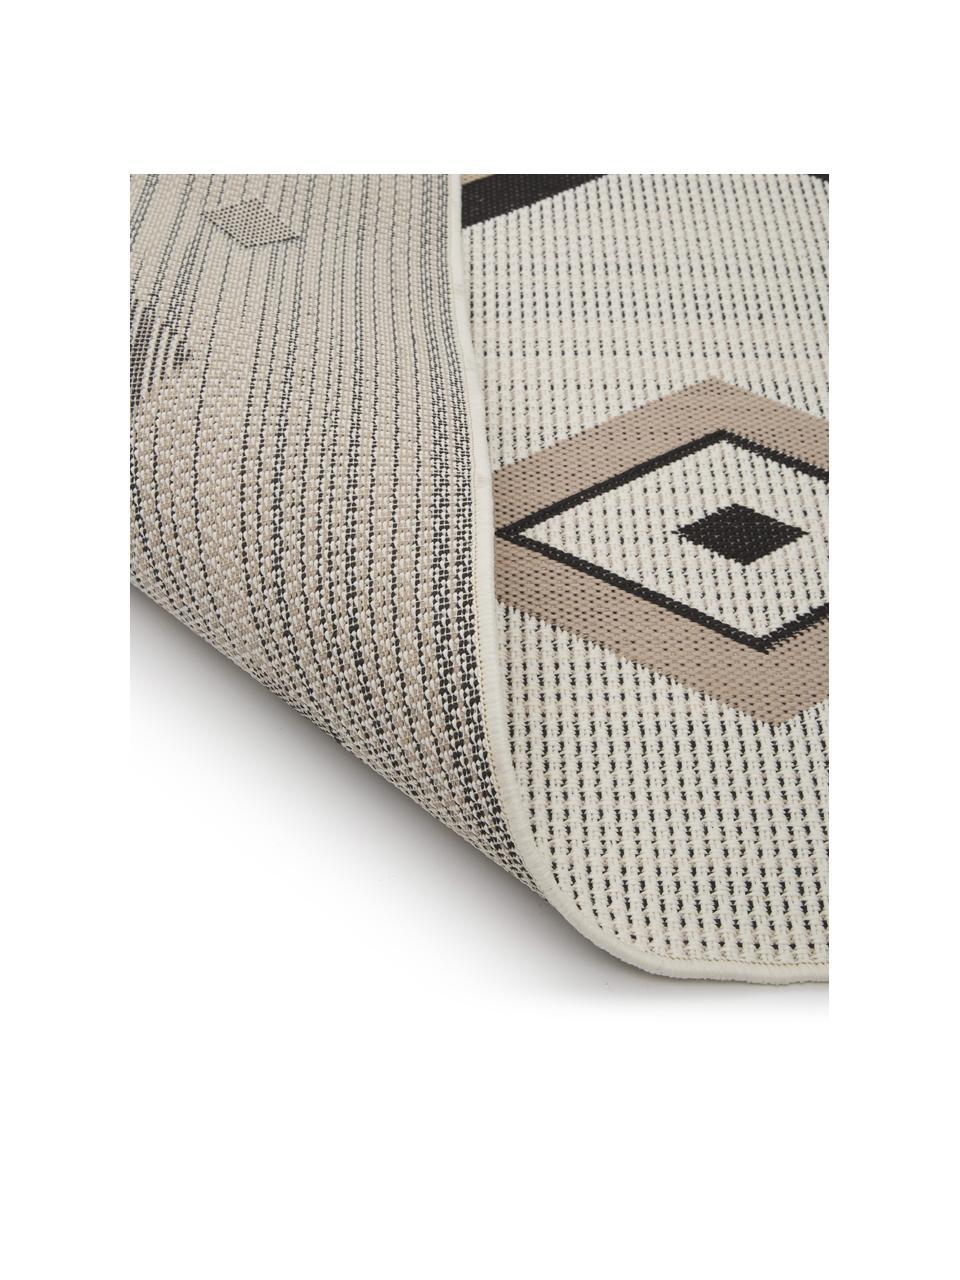 Alfombra de interior/exterior Nikita, estilo étnico, 86%polipropileno, 14%poliéster, Beige, negro, An 80 x L 250 cm